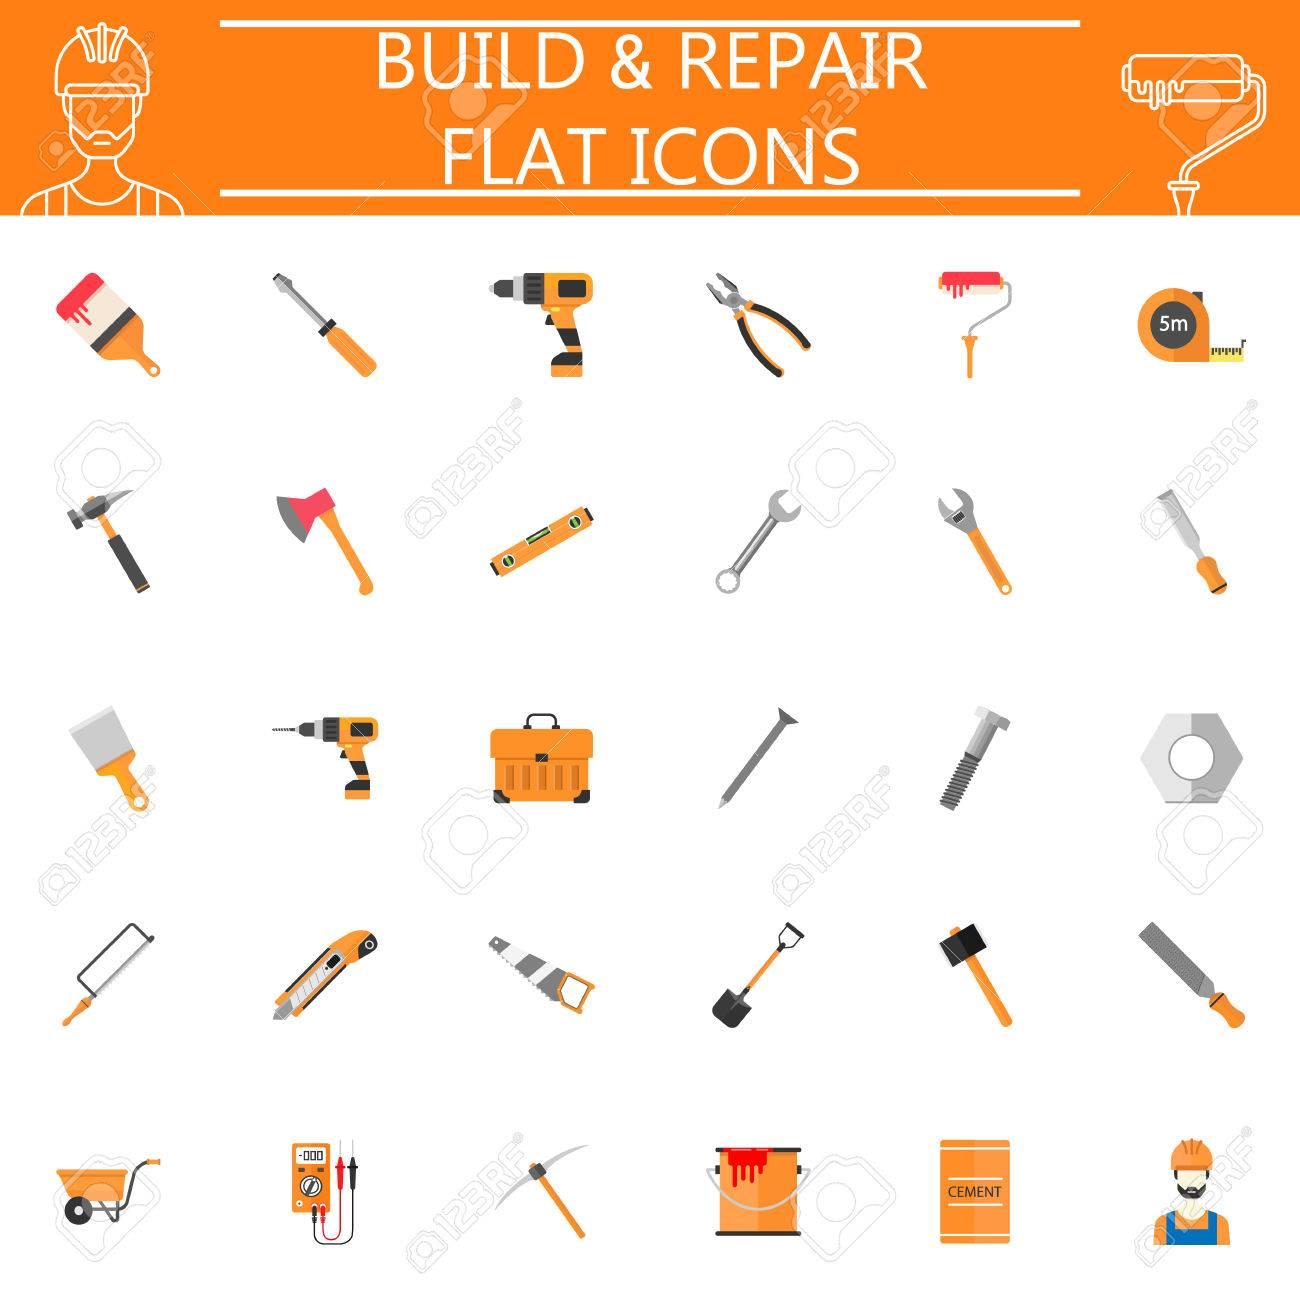 Build Repair Flat Pictograms Package Construction Symbols